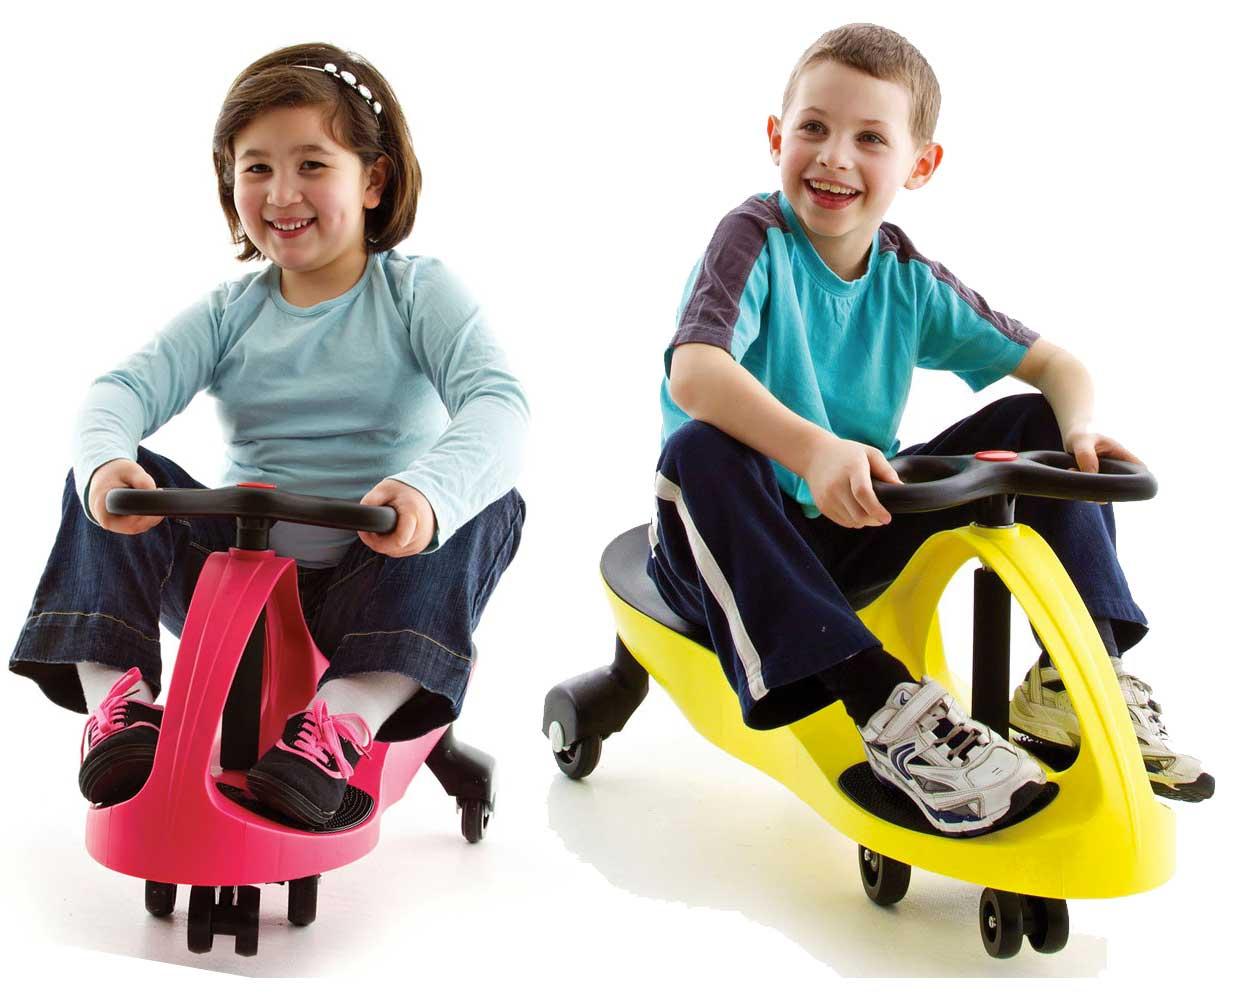 Didicar-Ride-On-Pink-1